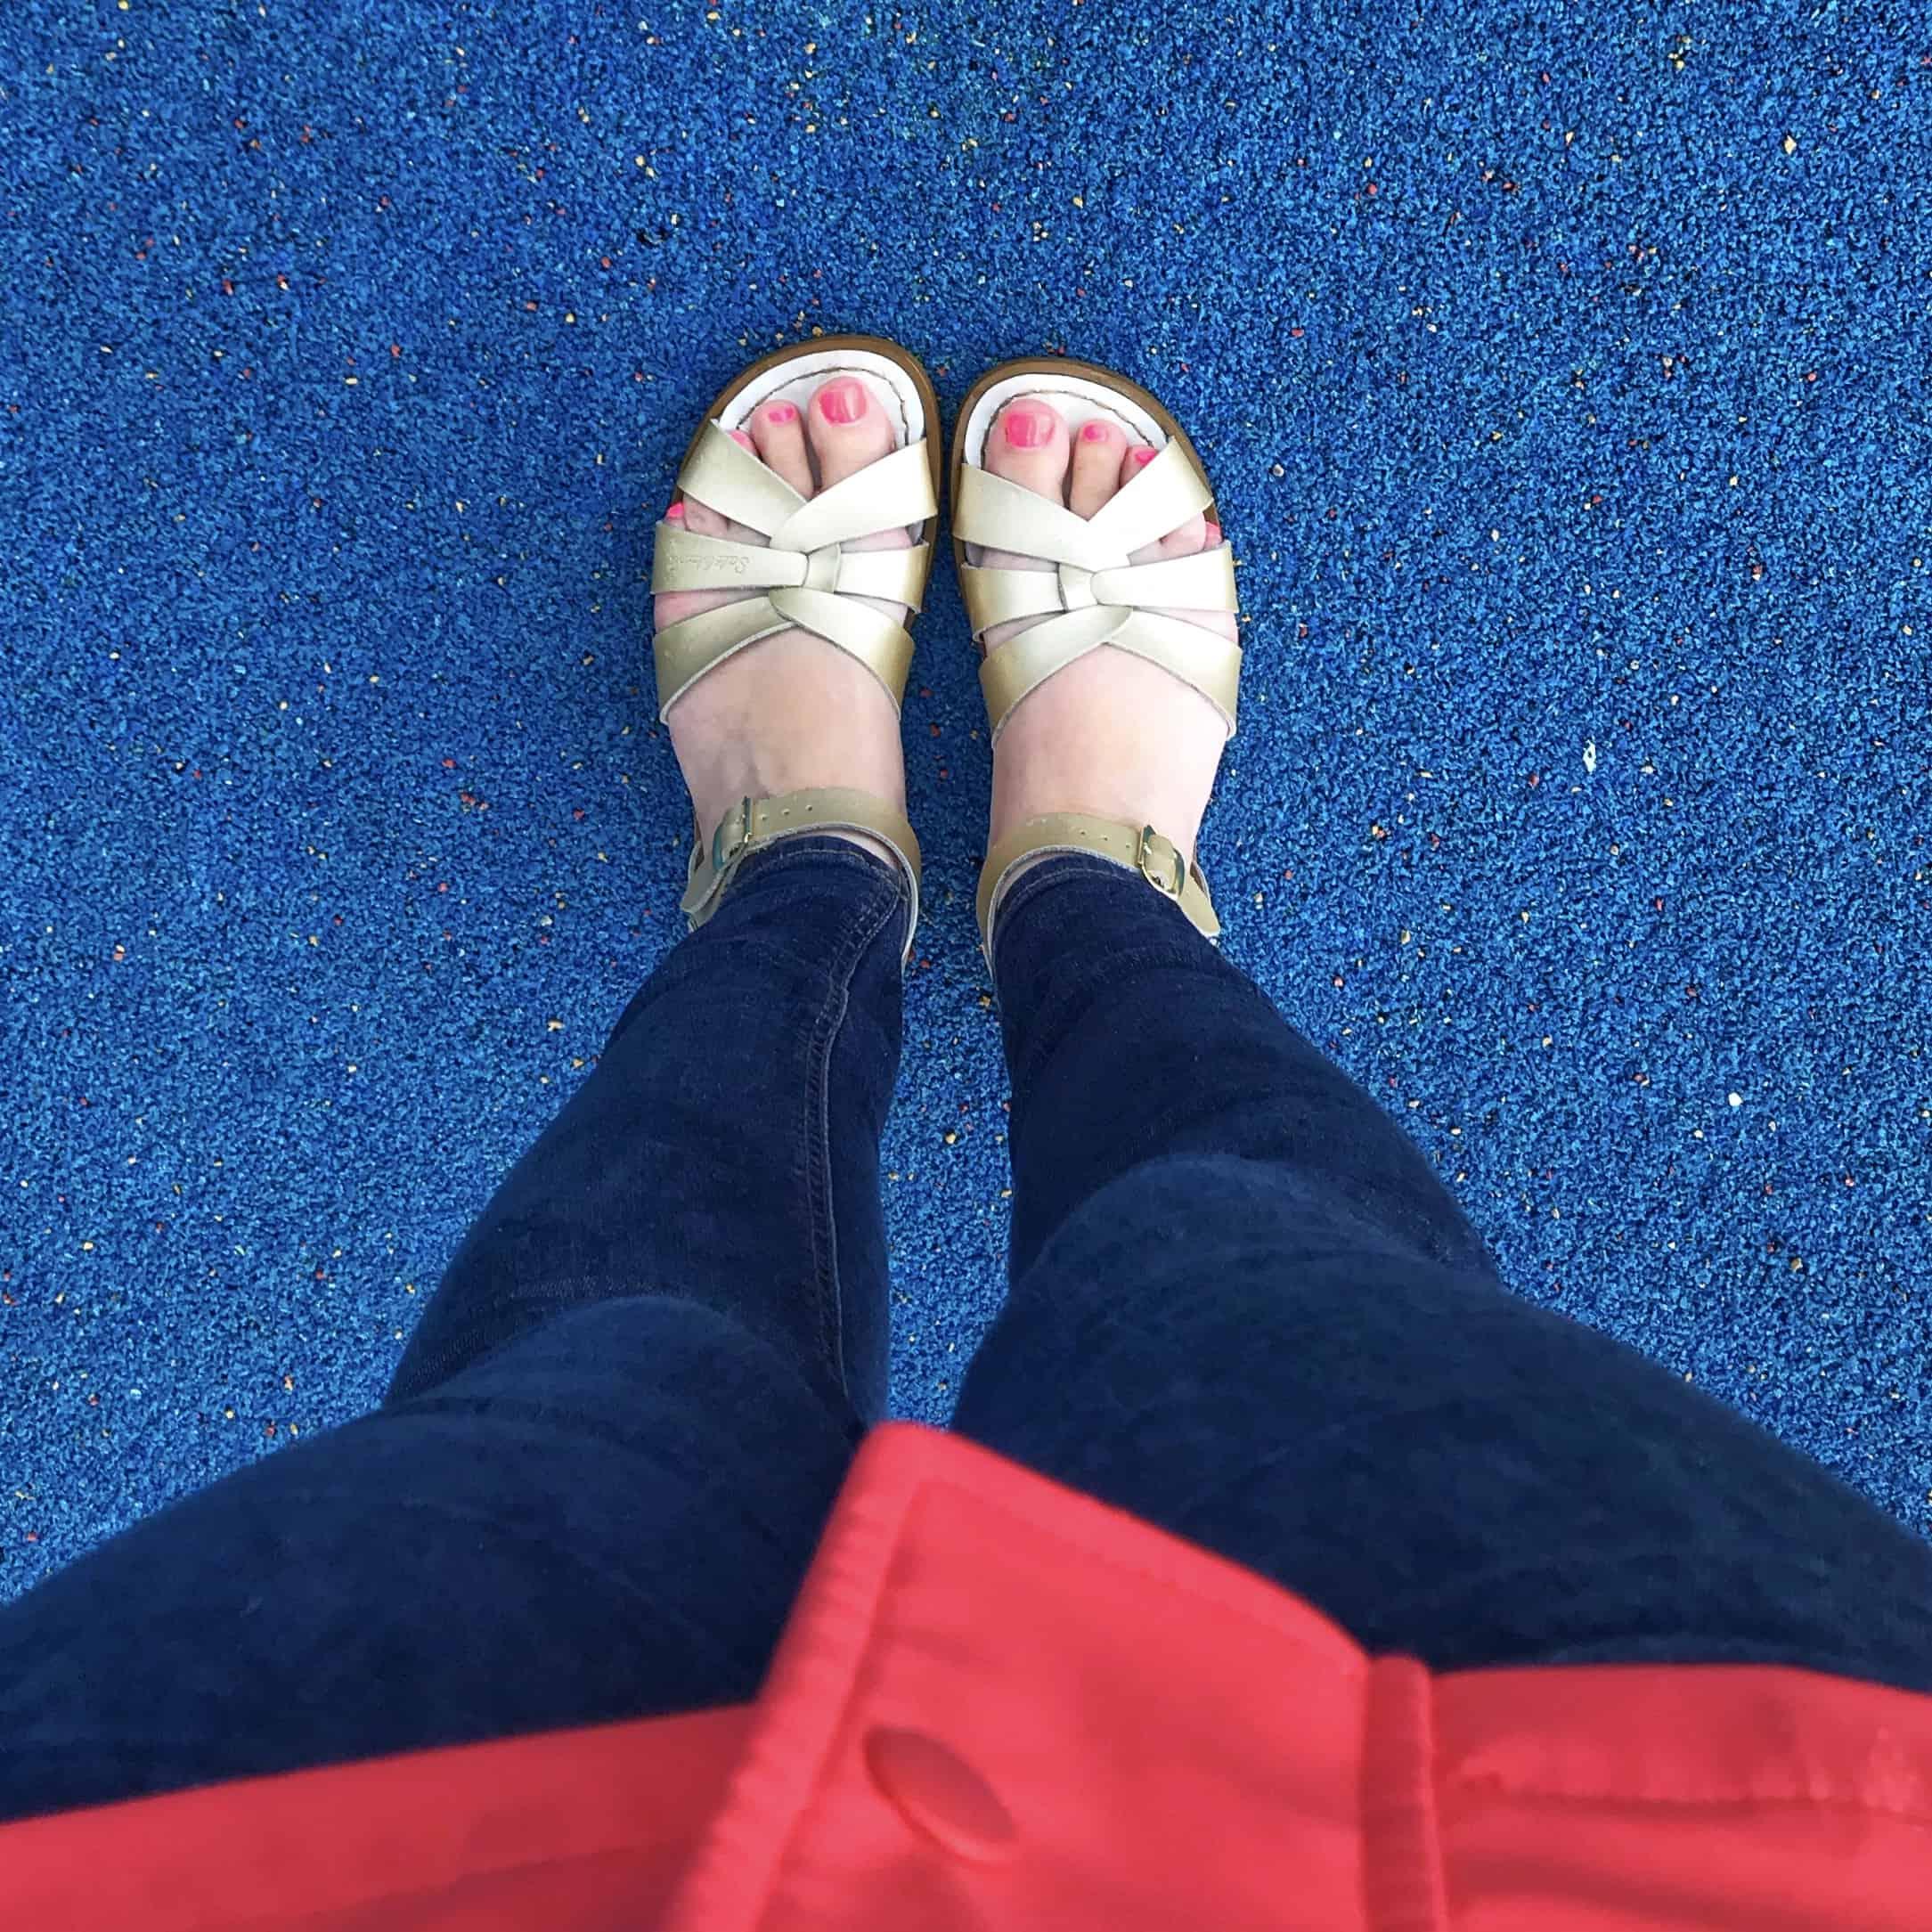 Gold Original Salt-Water Sandals in the rain